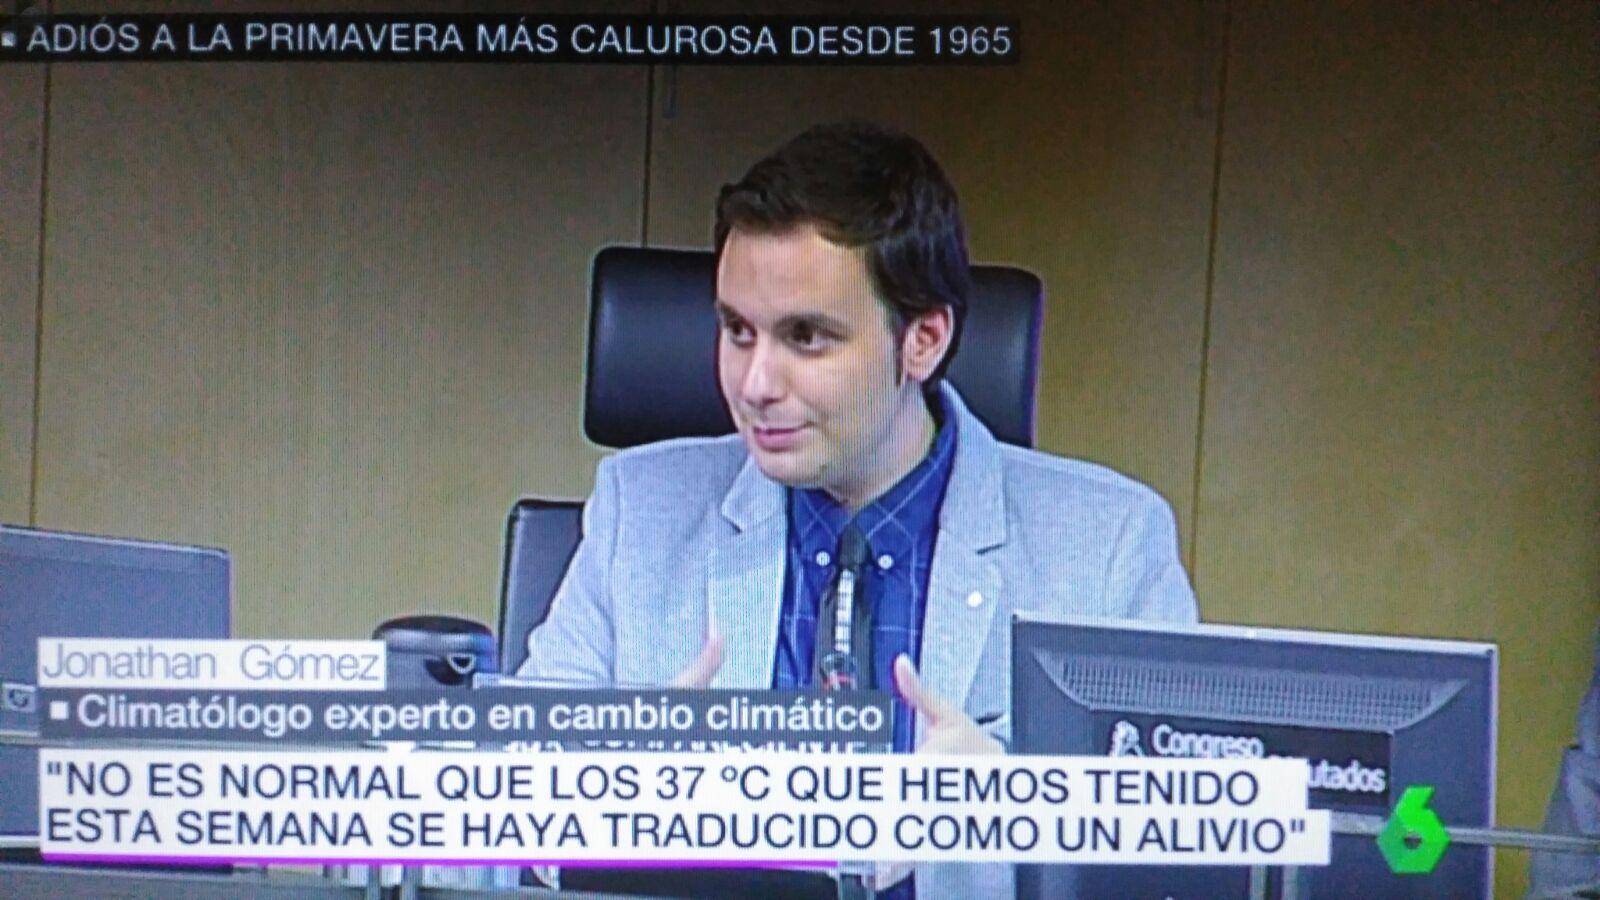 JONATHAN GOMEZ CANTERO CLIMATOLOGO